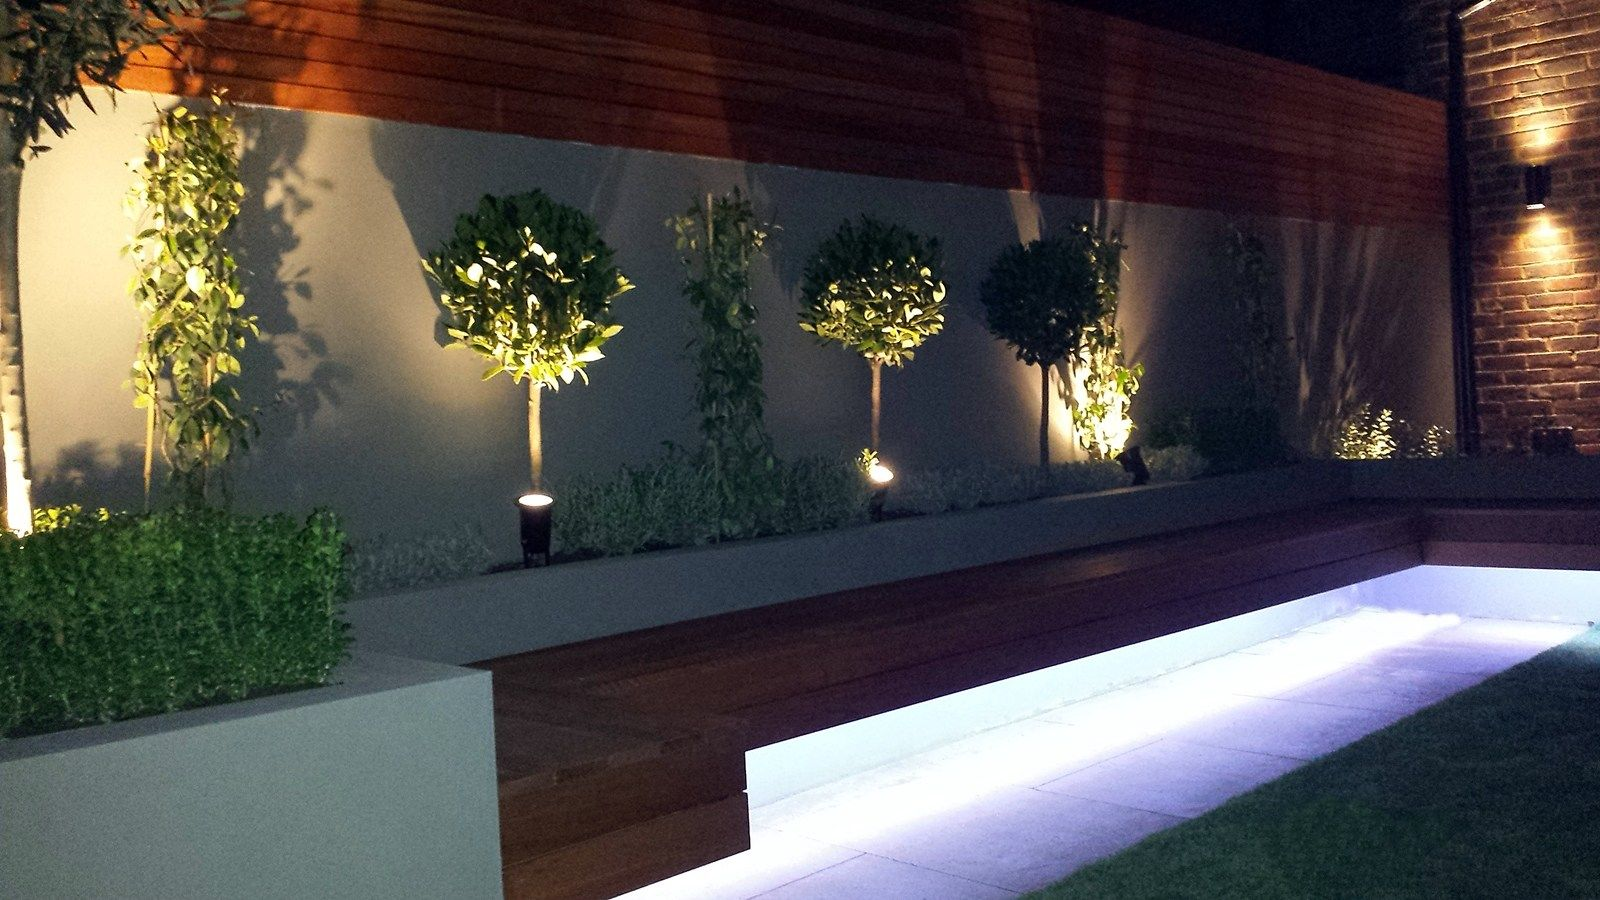 20 Beautiful Ways To Small Garden Lighting Ideas Modern Garden Design Small Garden Design Landscape Lighting Design